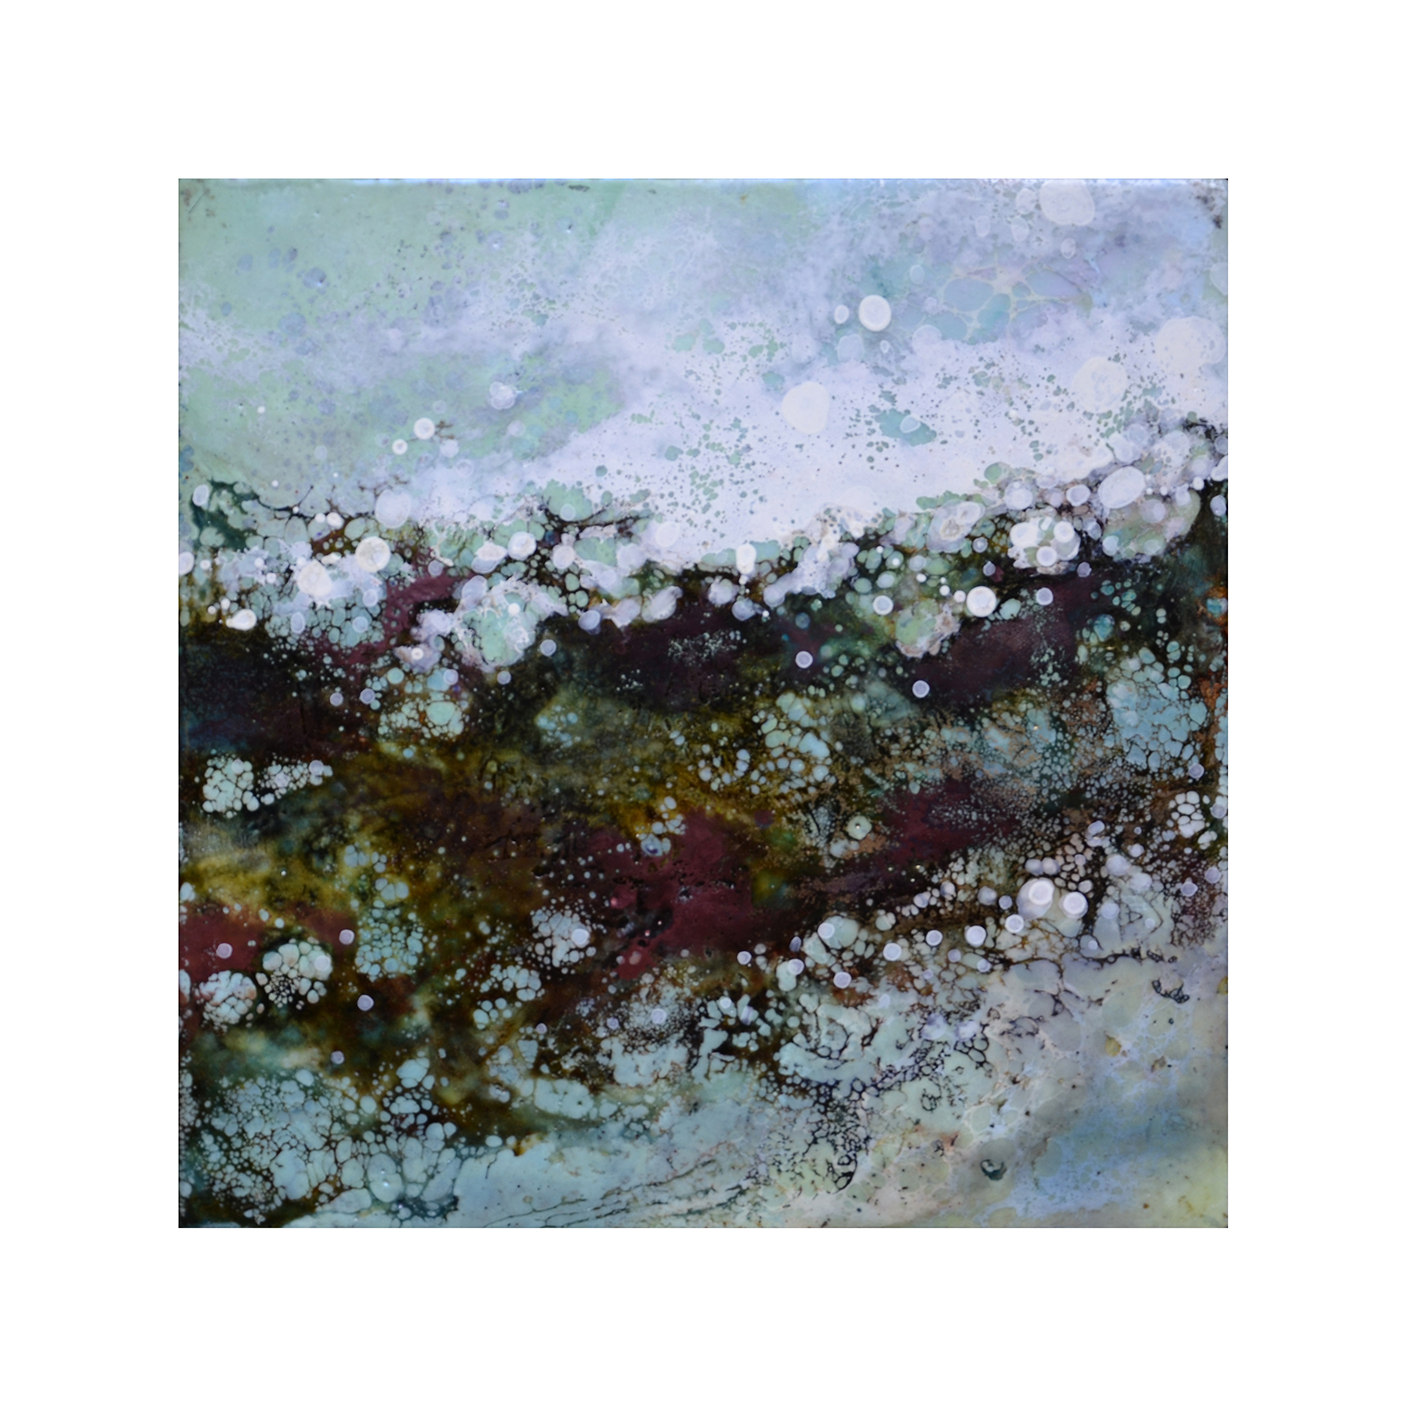 Effervescent Landscape 3   12 x 12  Encaustic on Panel  $300